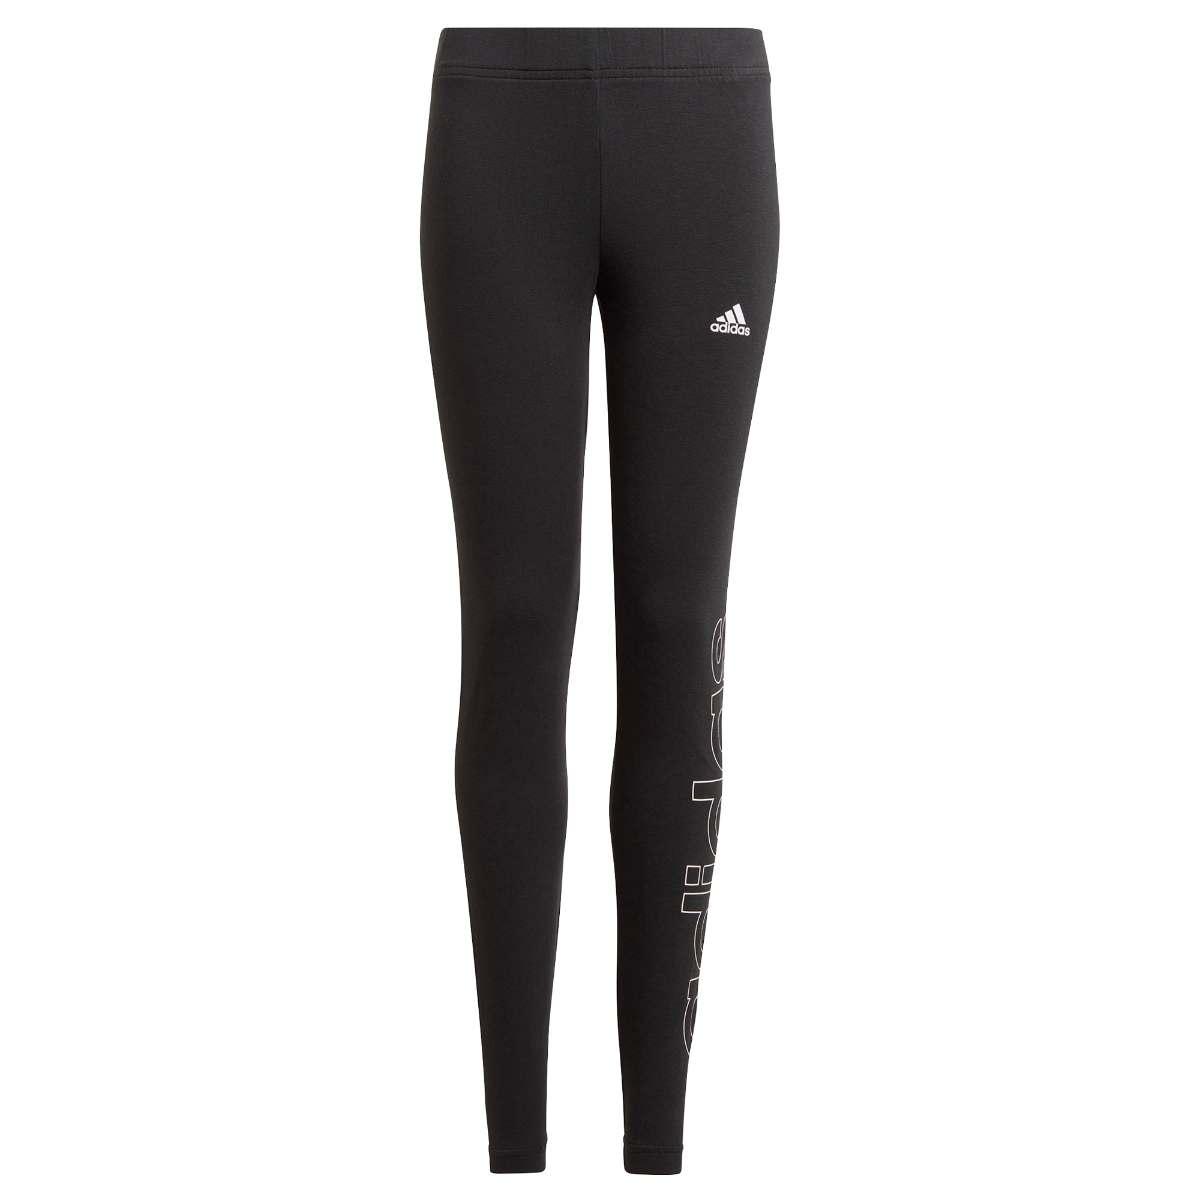 Adidas G LIN LEG meisjes tight